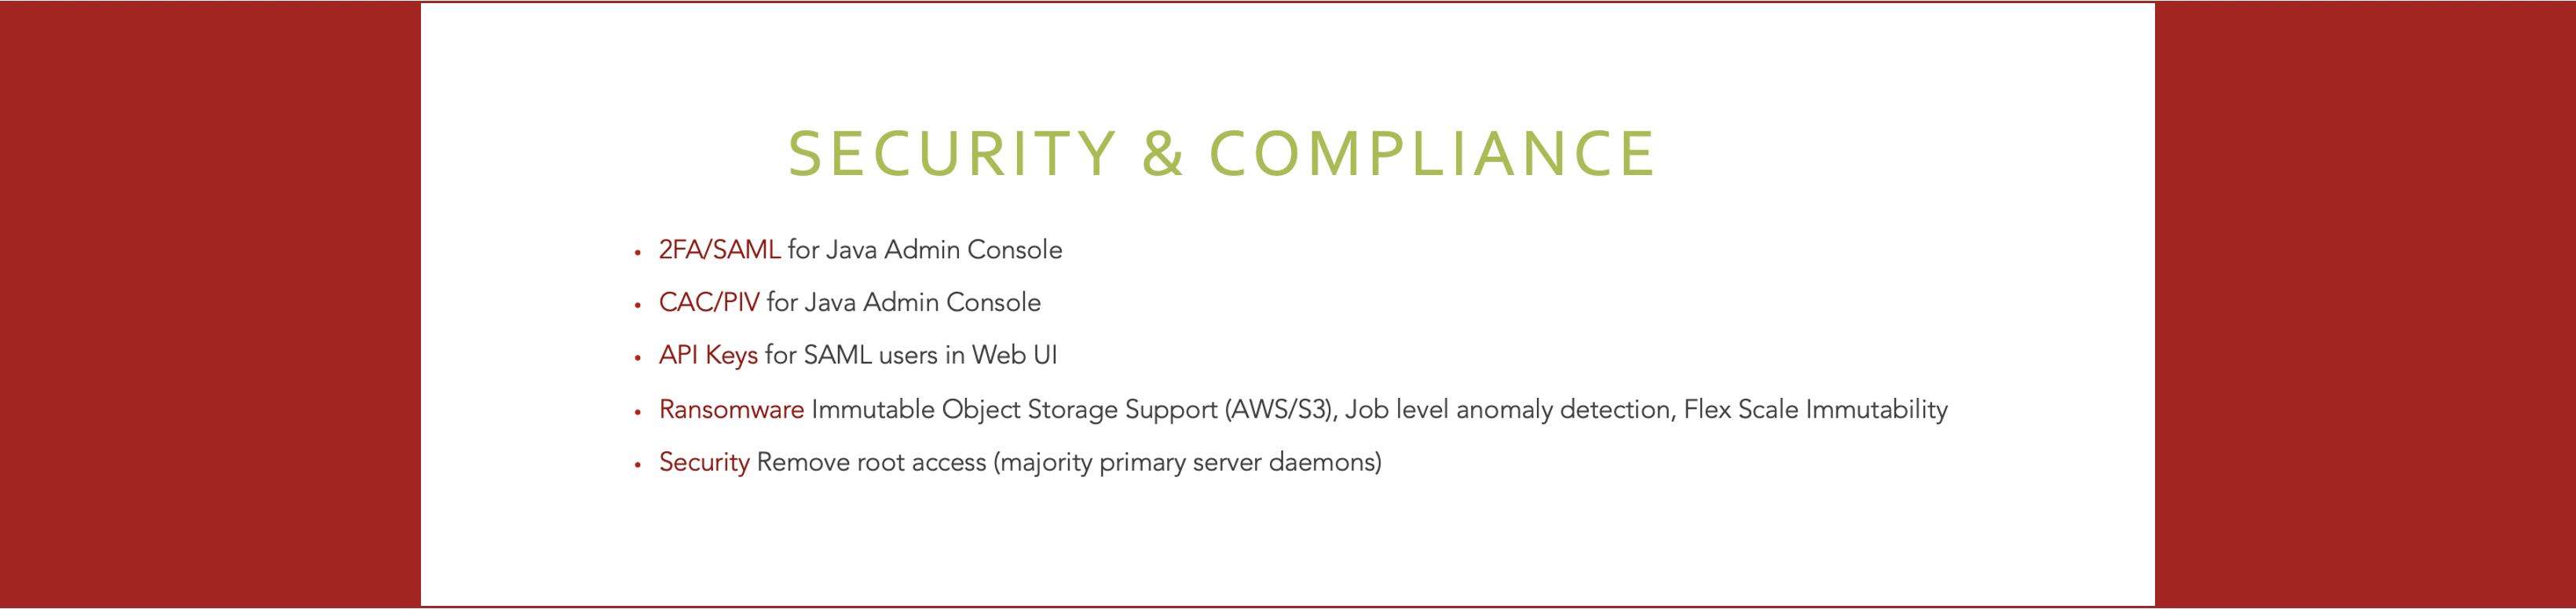 Feature 4 - Security & Compliance